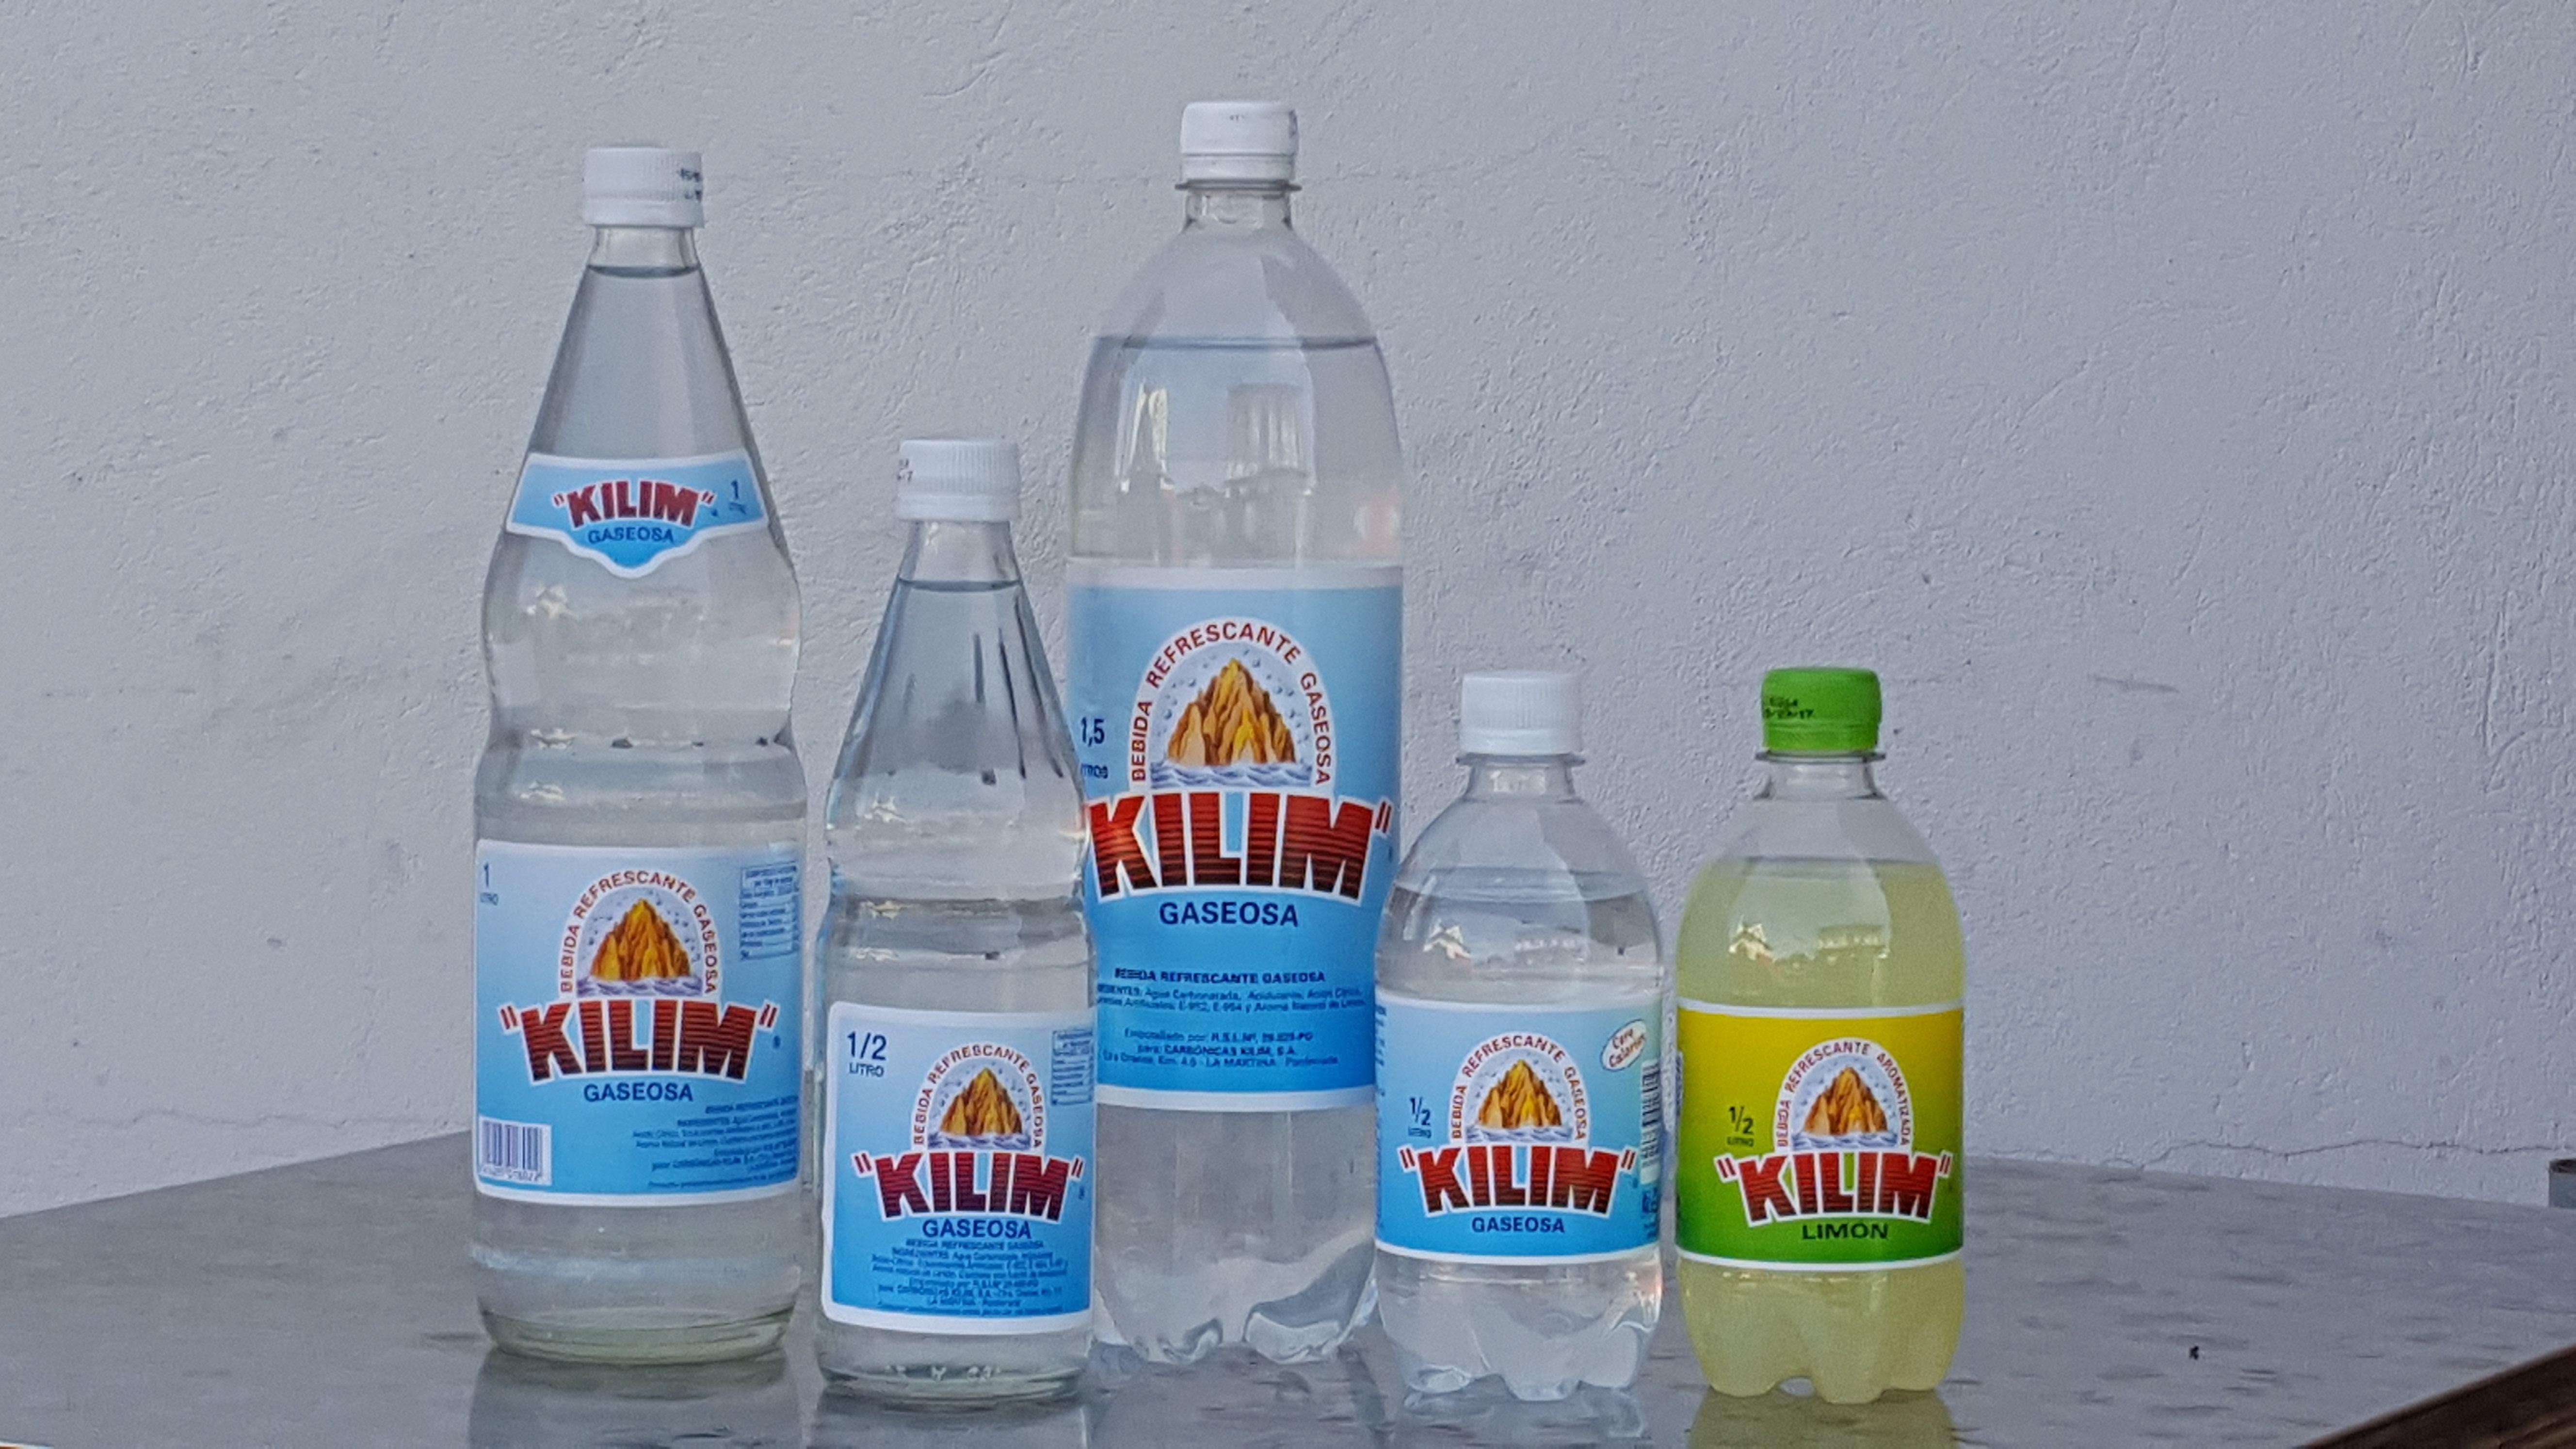 Distribución de gaseosa Kilim en León